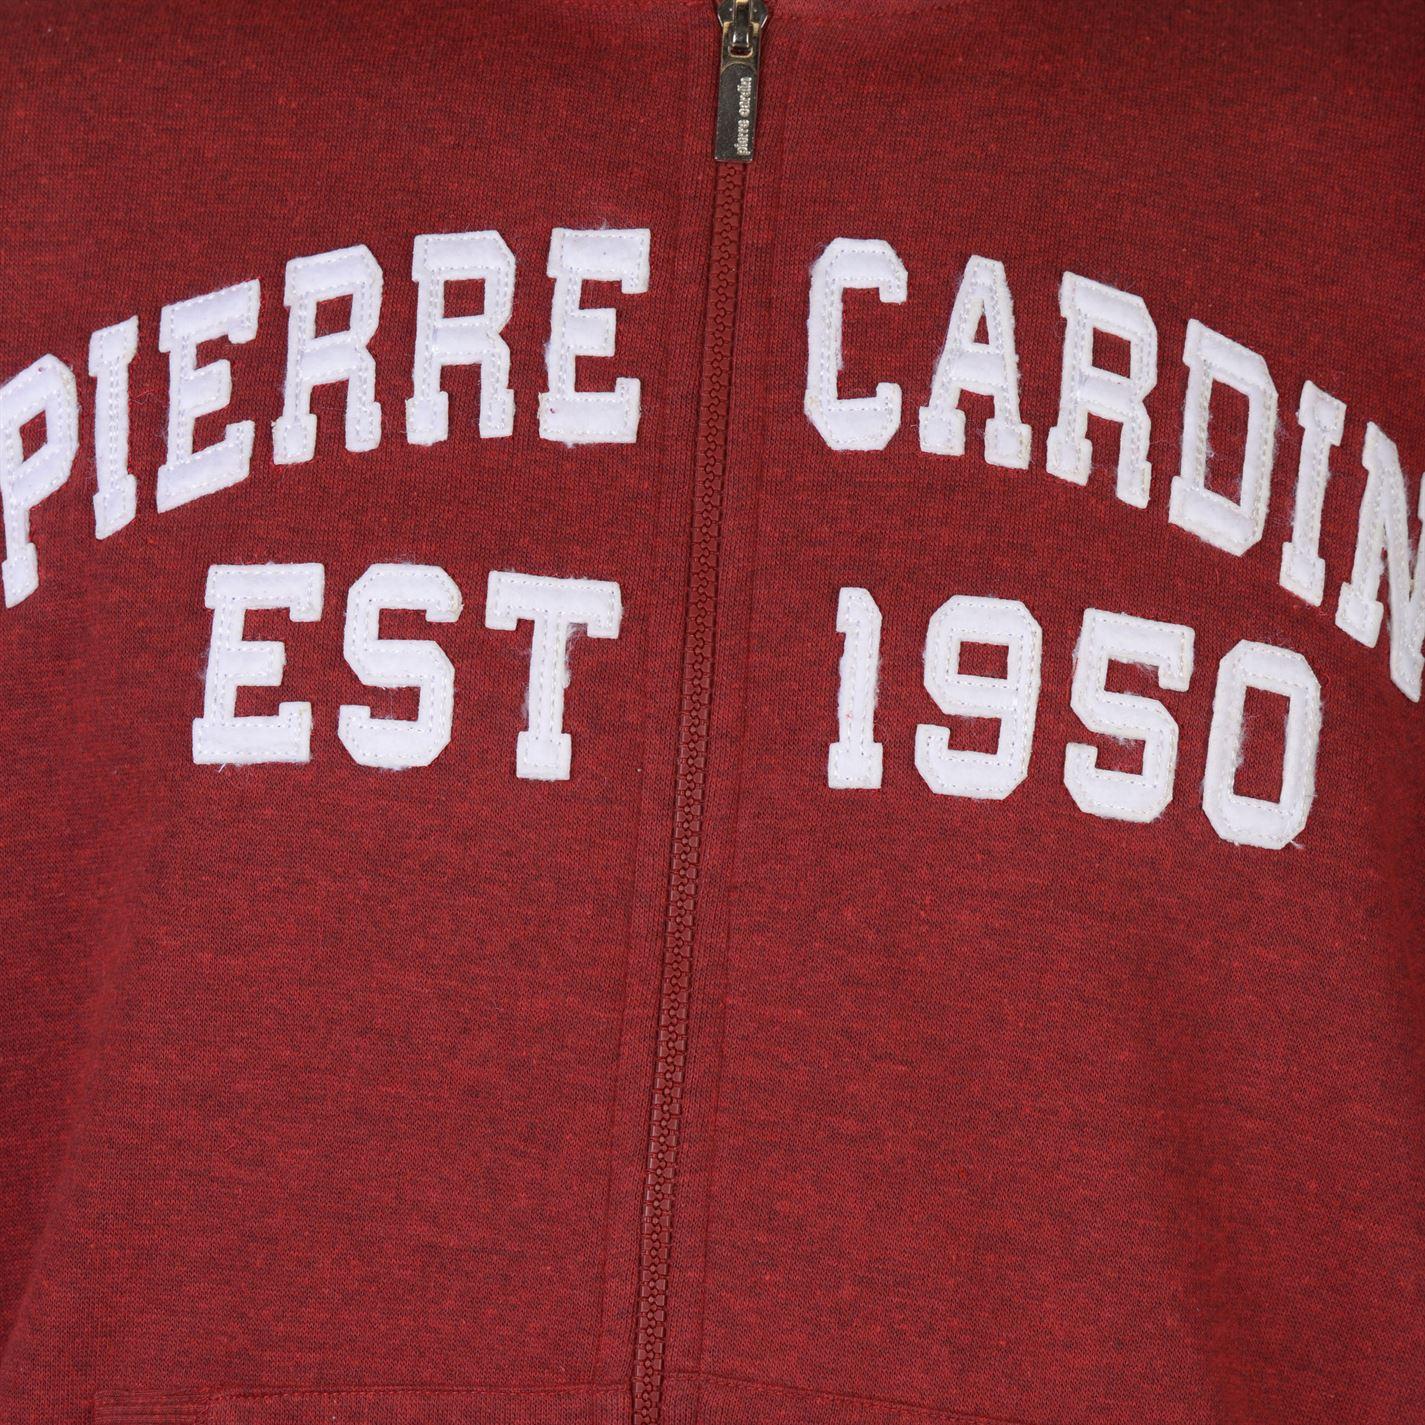 Pierre Cardin Applique Zip Hoodie Mens Gents Hoody Hooded Top Zipped